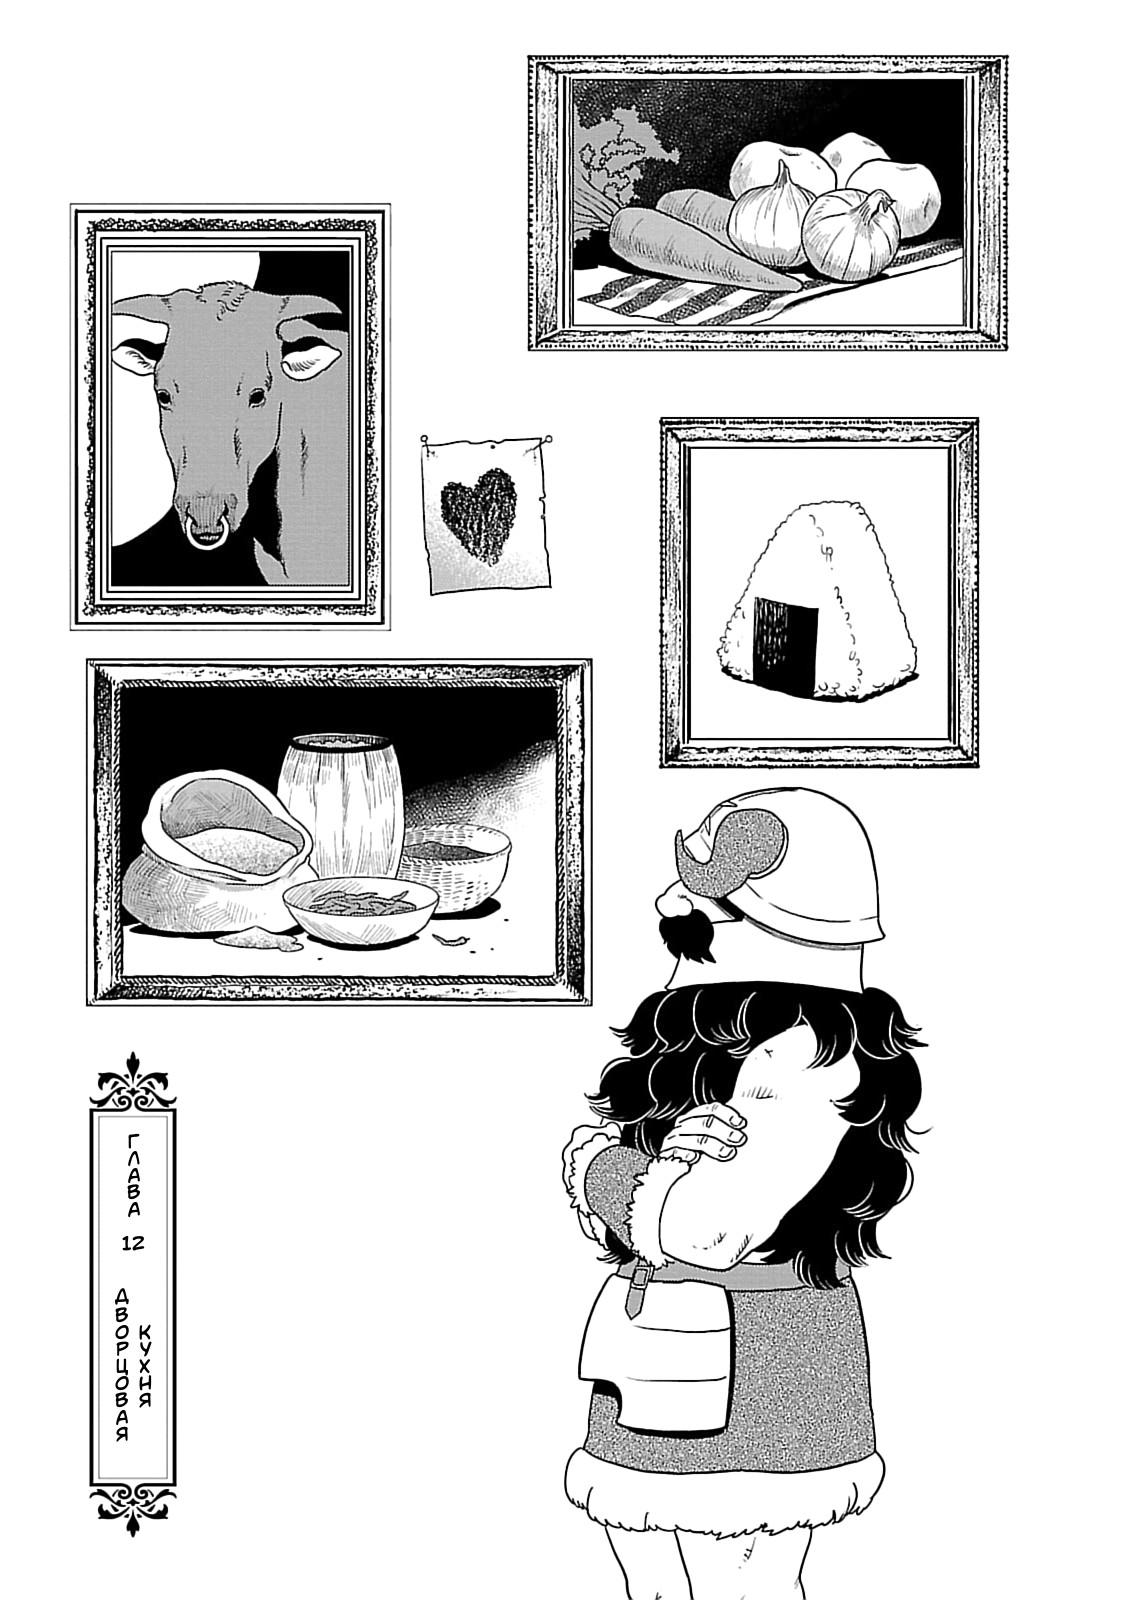 https://r1.ninemanga.com/comics/pic2/50/27634/313788/1480604821379.jpg Page 1